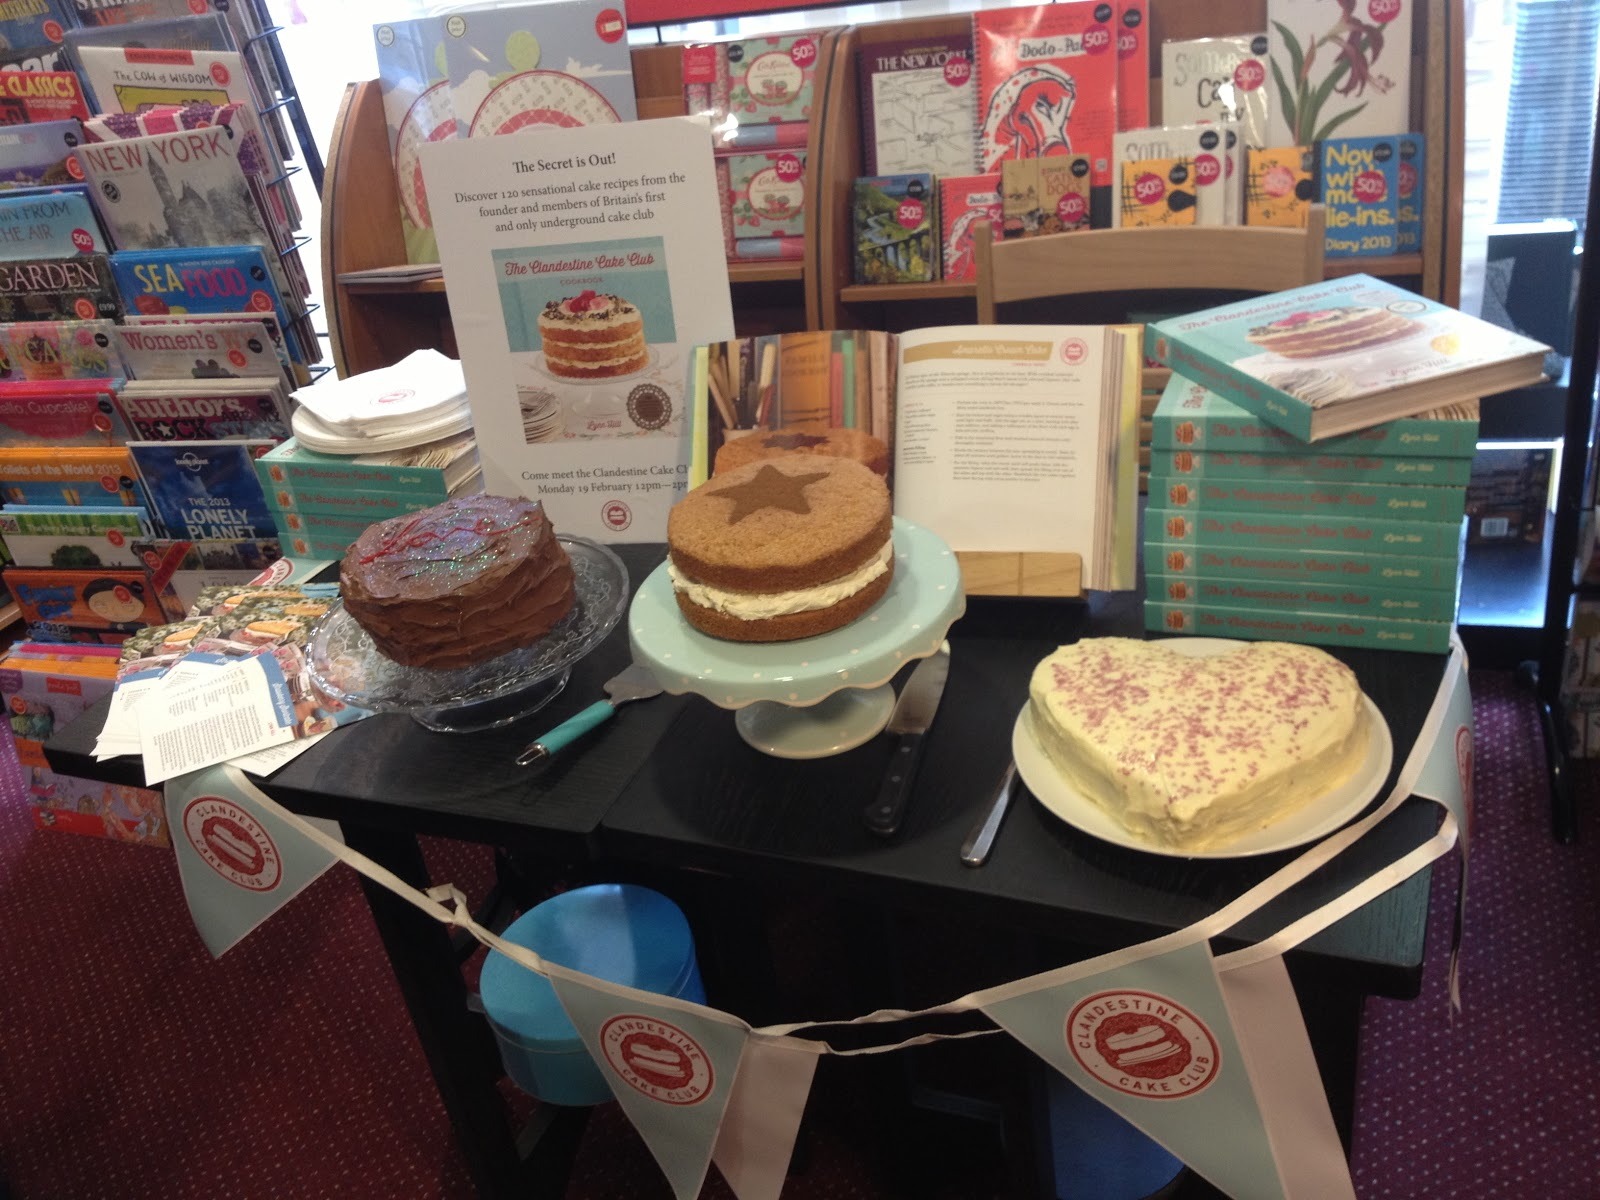 Red Velvet Cake Recipe Uk Nigella: Mrs Bishop's Bakes And Banter: February 2013